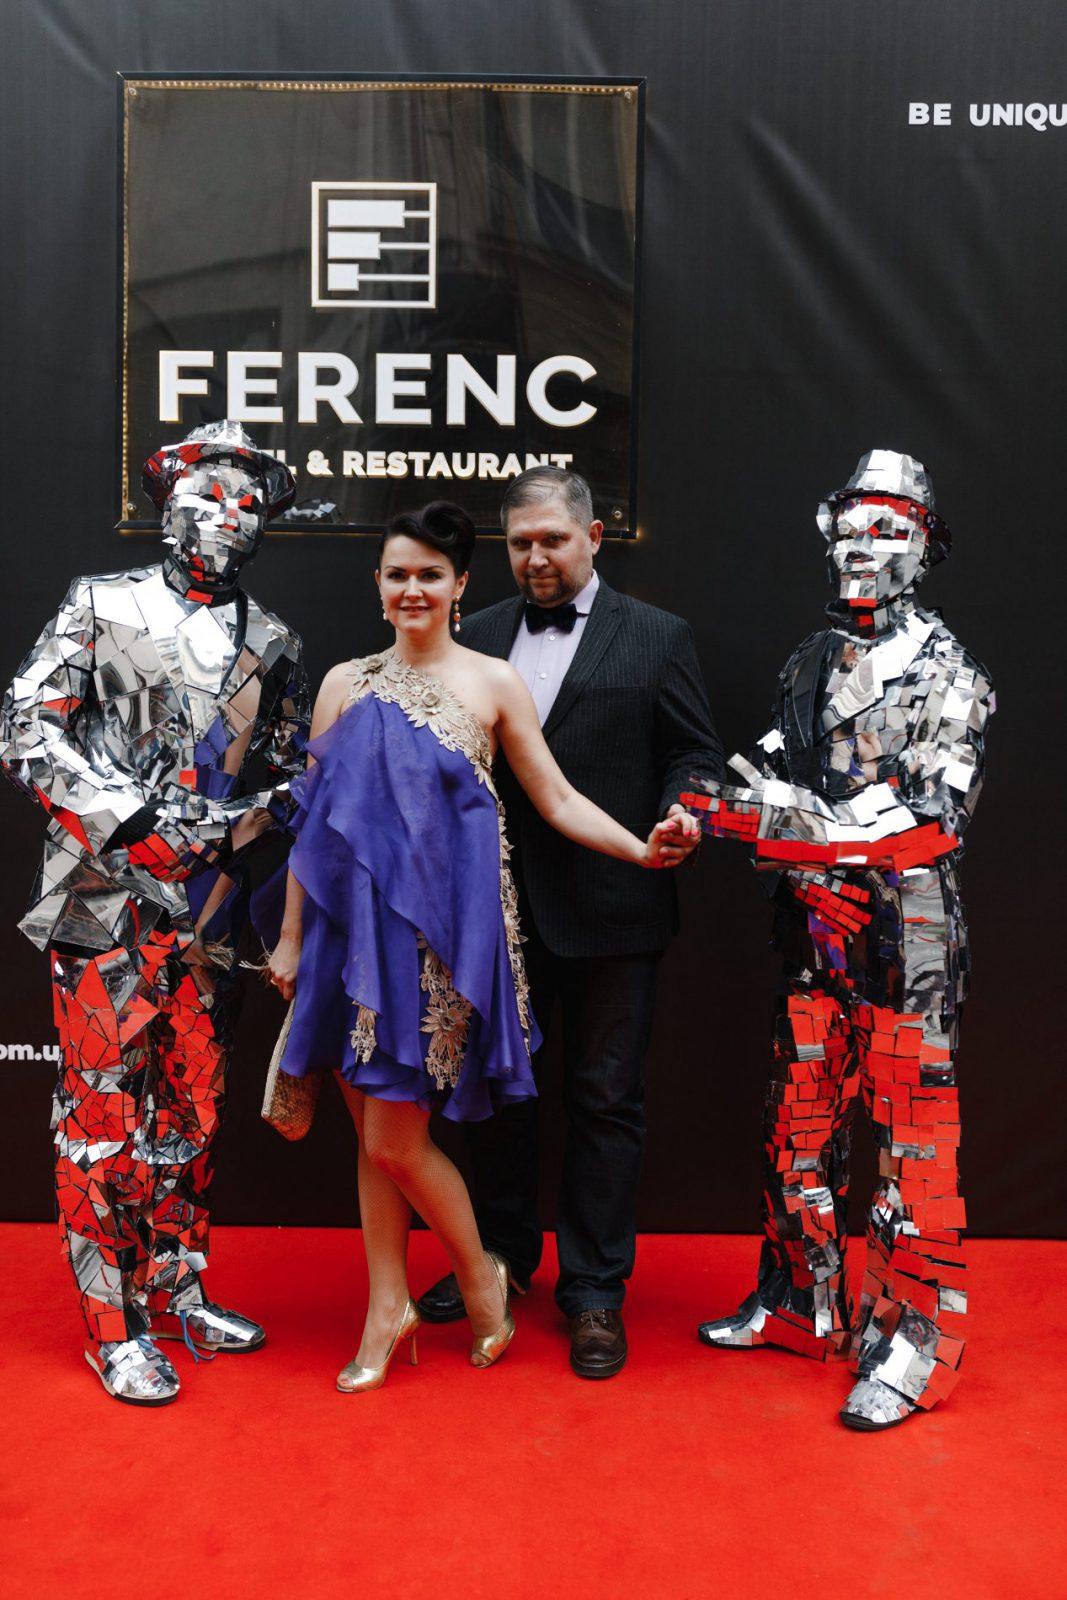 Ferenc0065